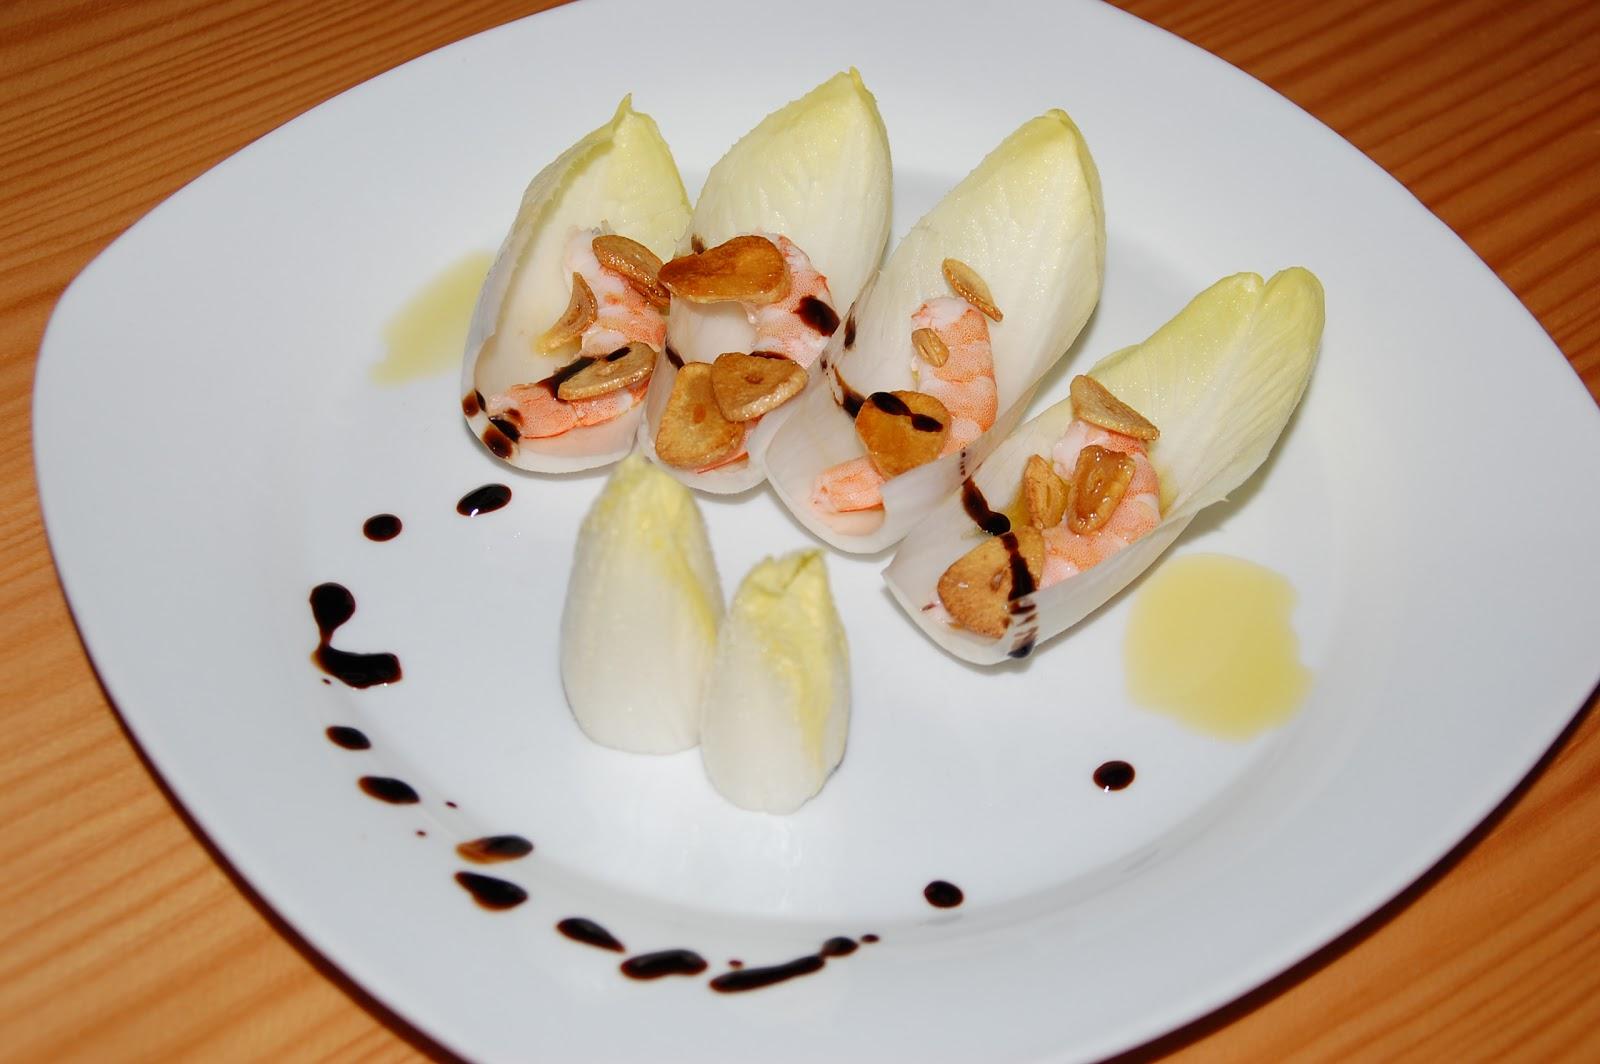 Mis ensaladas favoritas ensalada de endivias con langostinos - Ensalada de langostinos ...